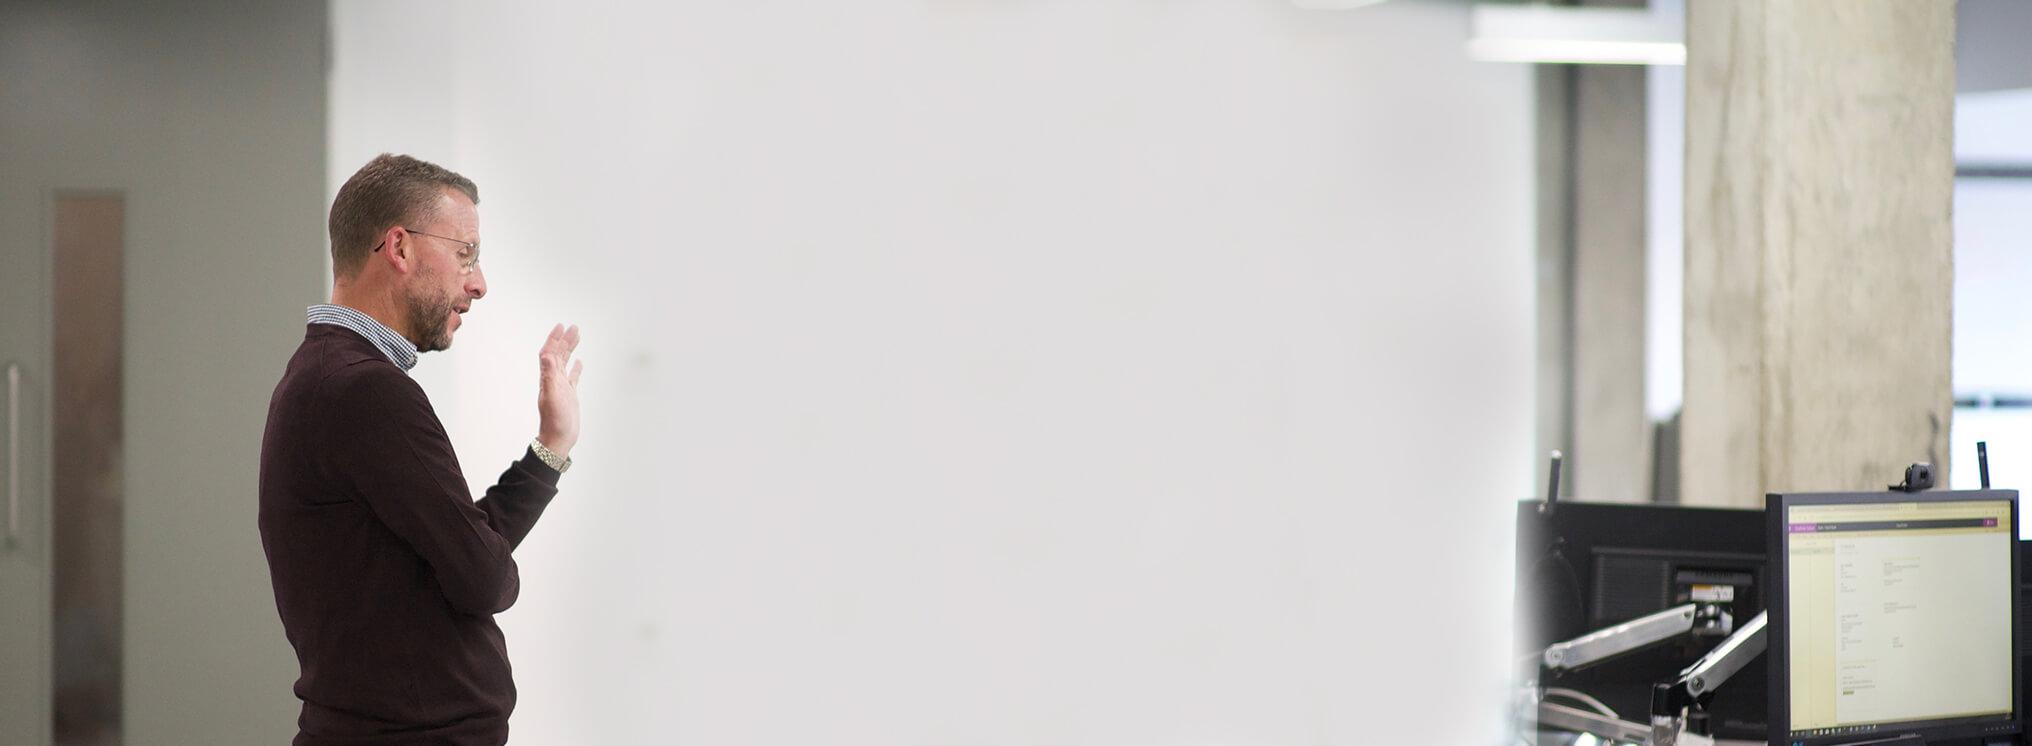 redpixie azure cloud banner.jpg